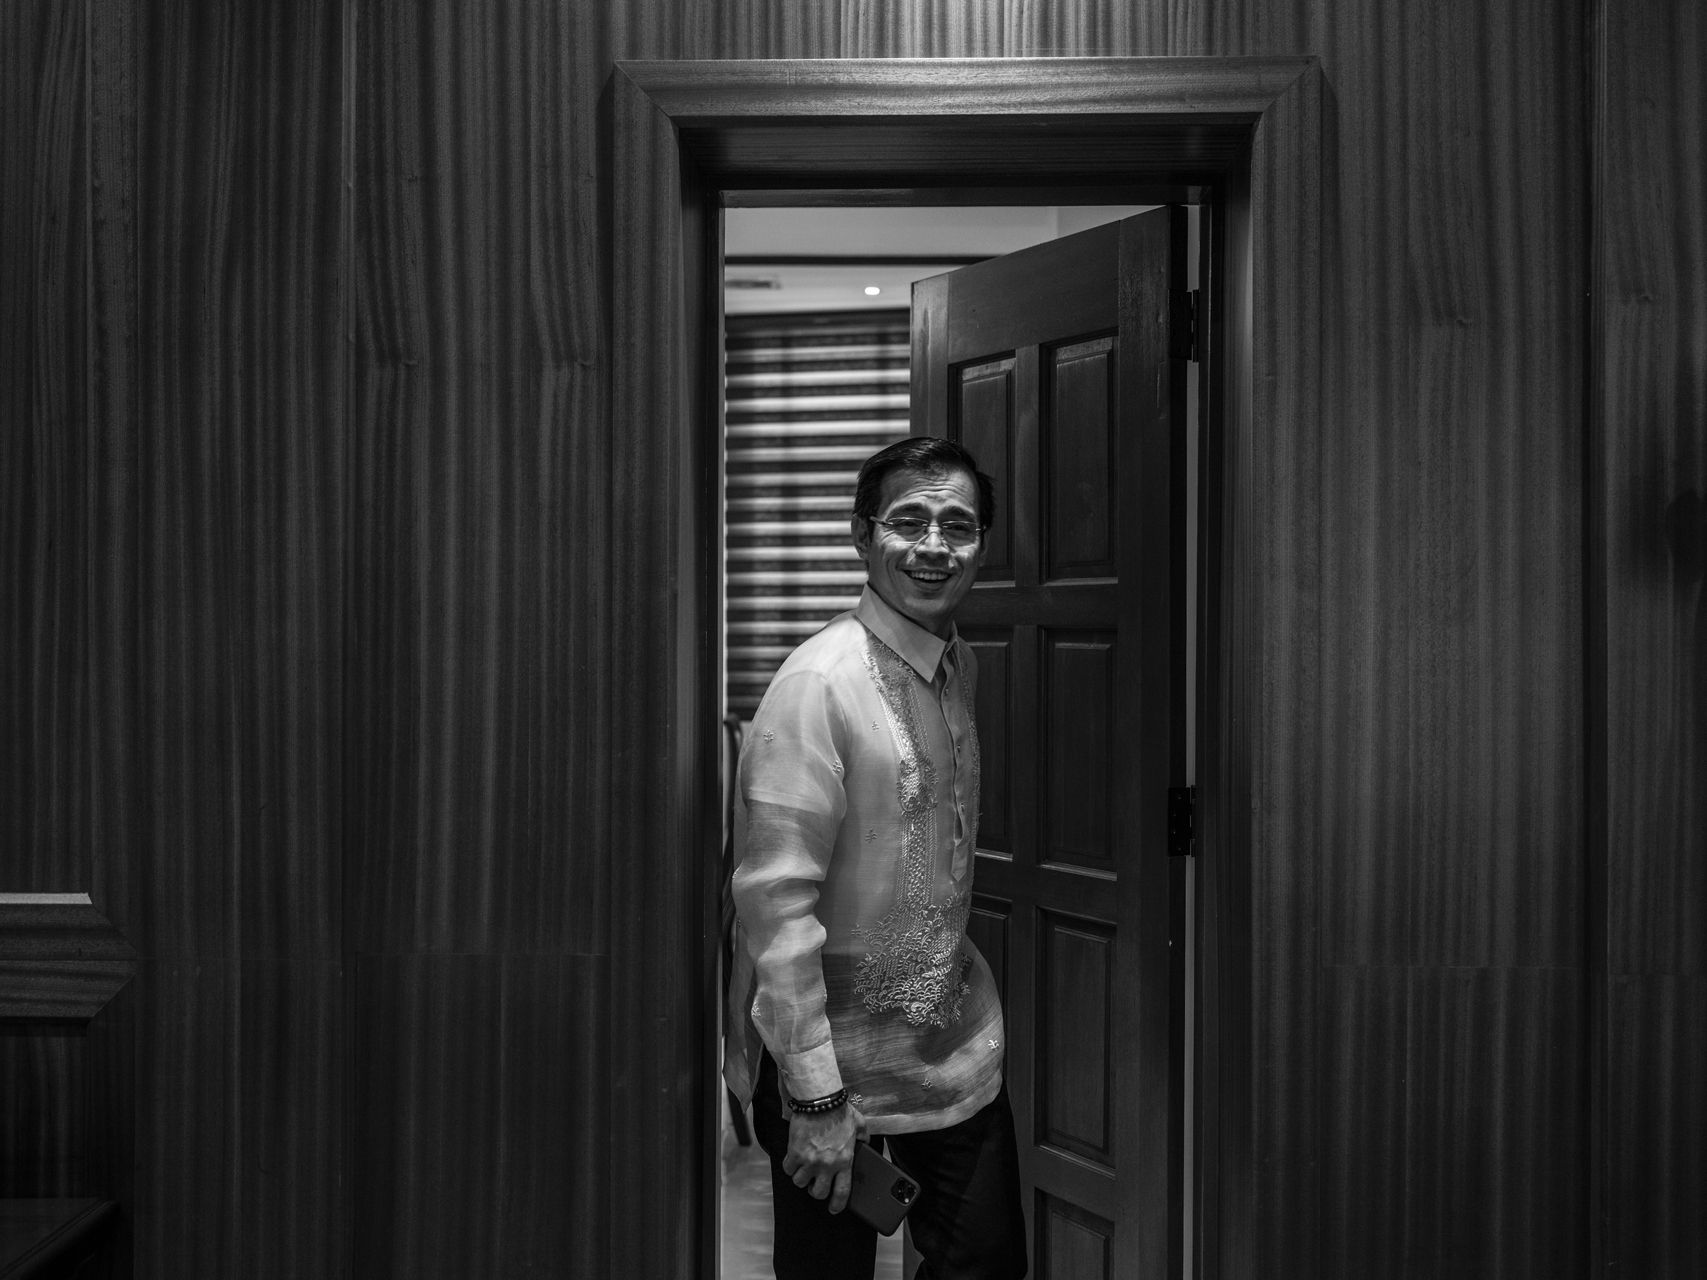 A Day In The Life Of Manila Mayor Isko Moreno